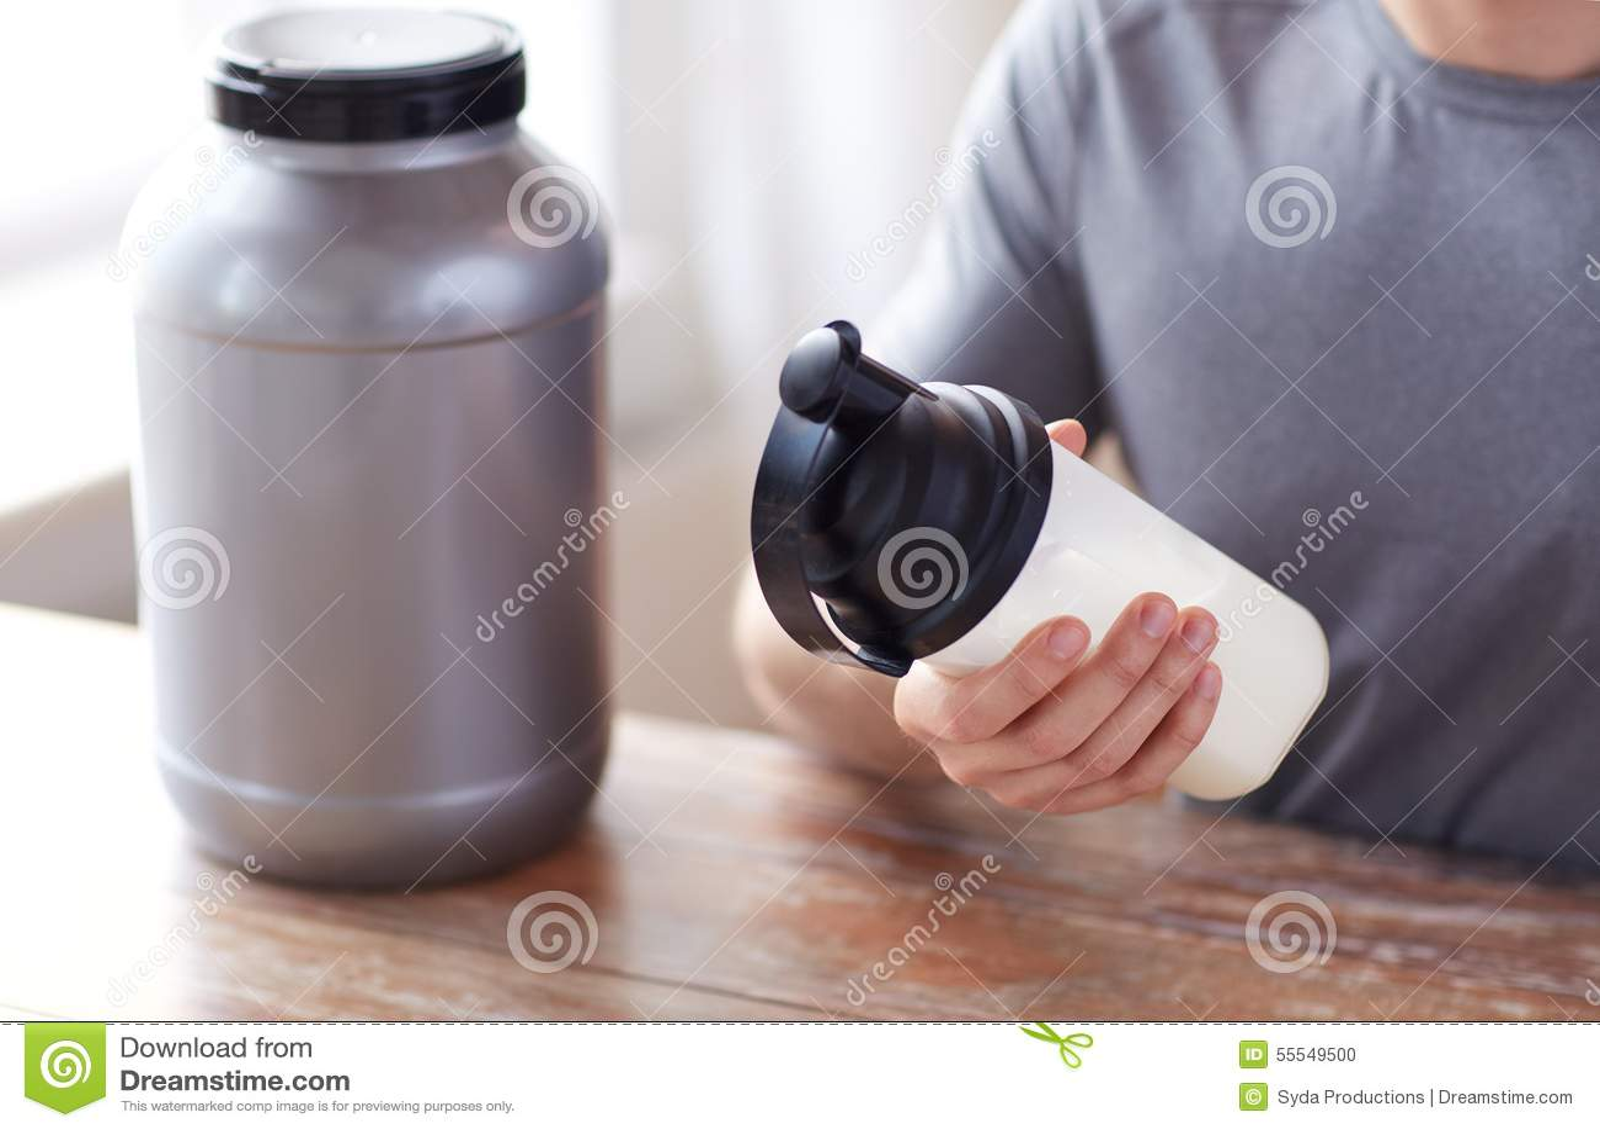 Healthy Nutrition. Man Preparing Protein Shake. Food